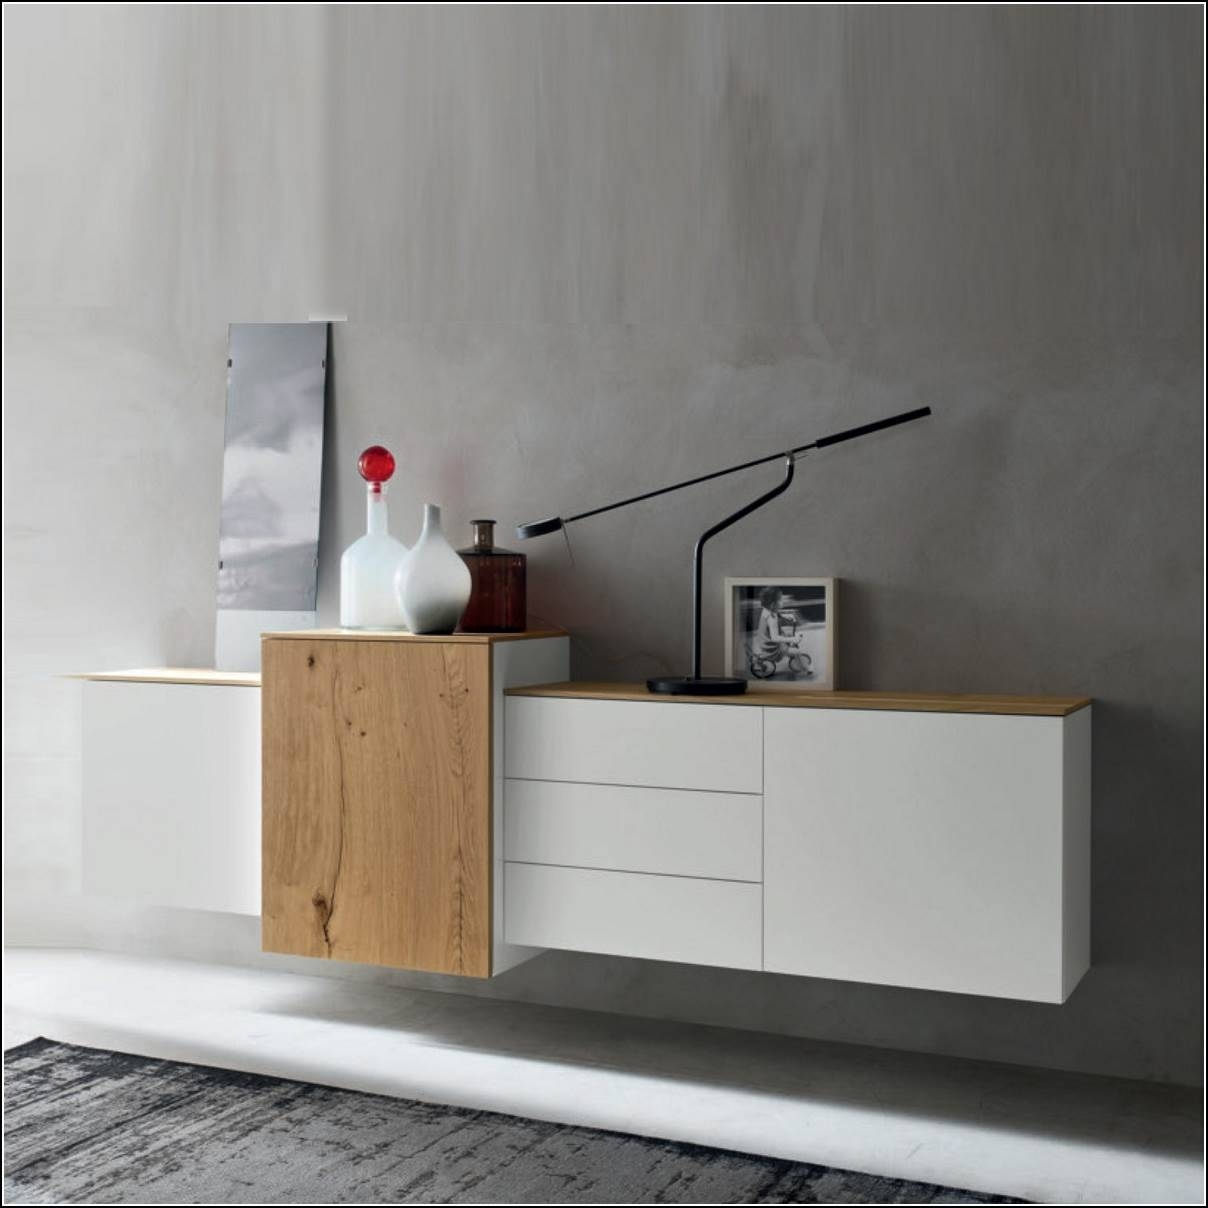 Sideboards | Best Living Room Design Ideas inside Grey Gloss Sideboards (Image 21 of 30)